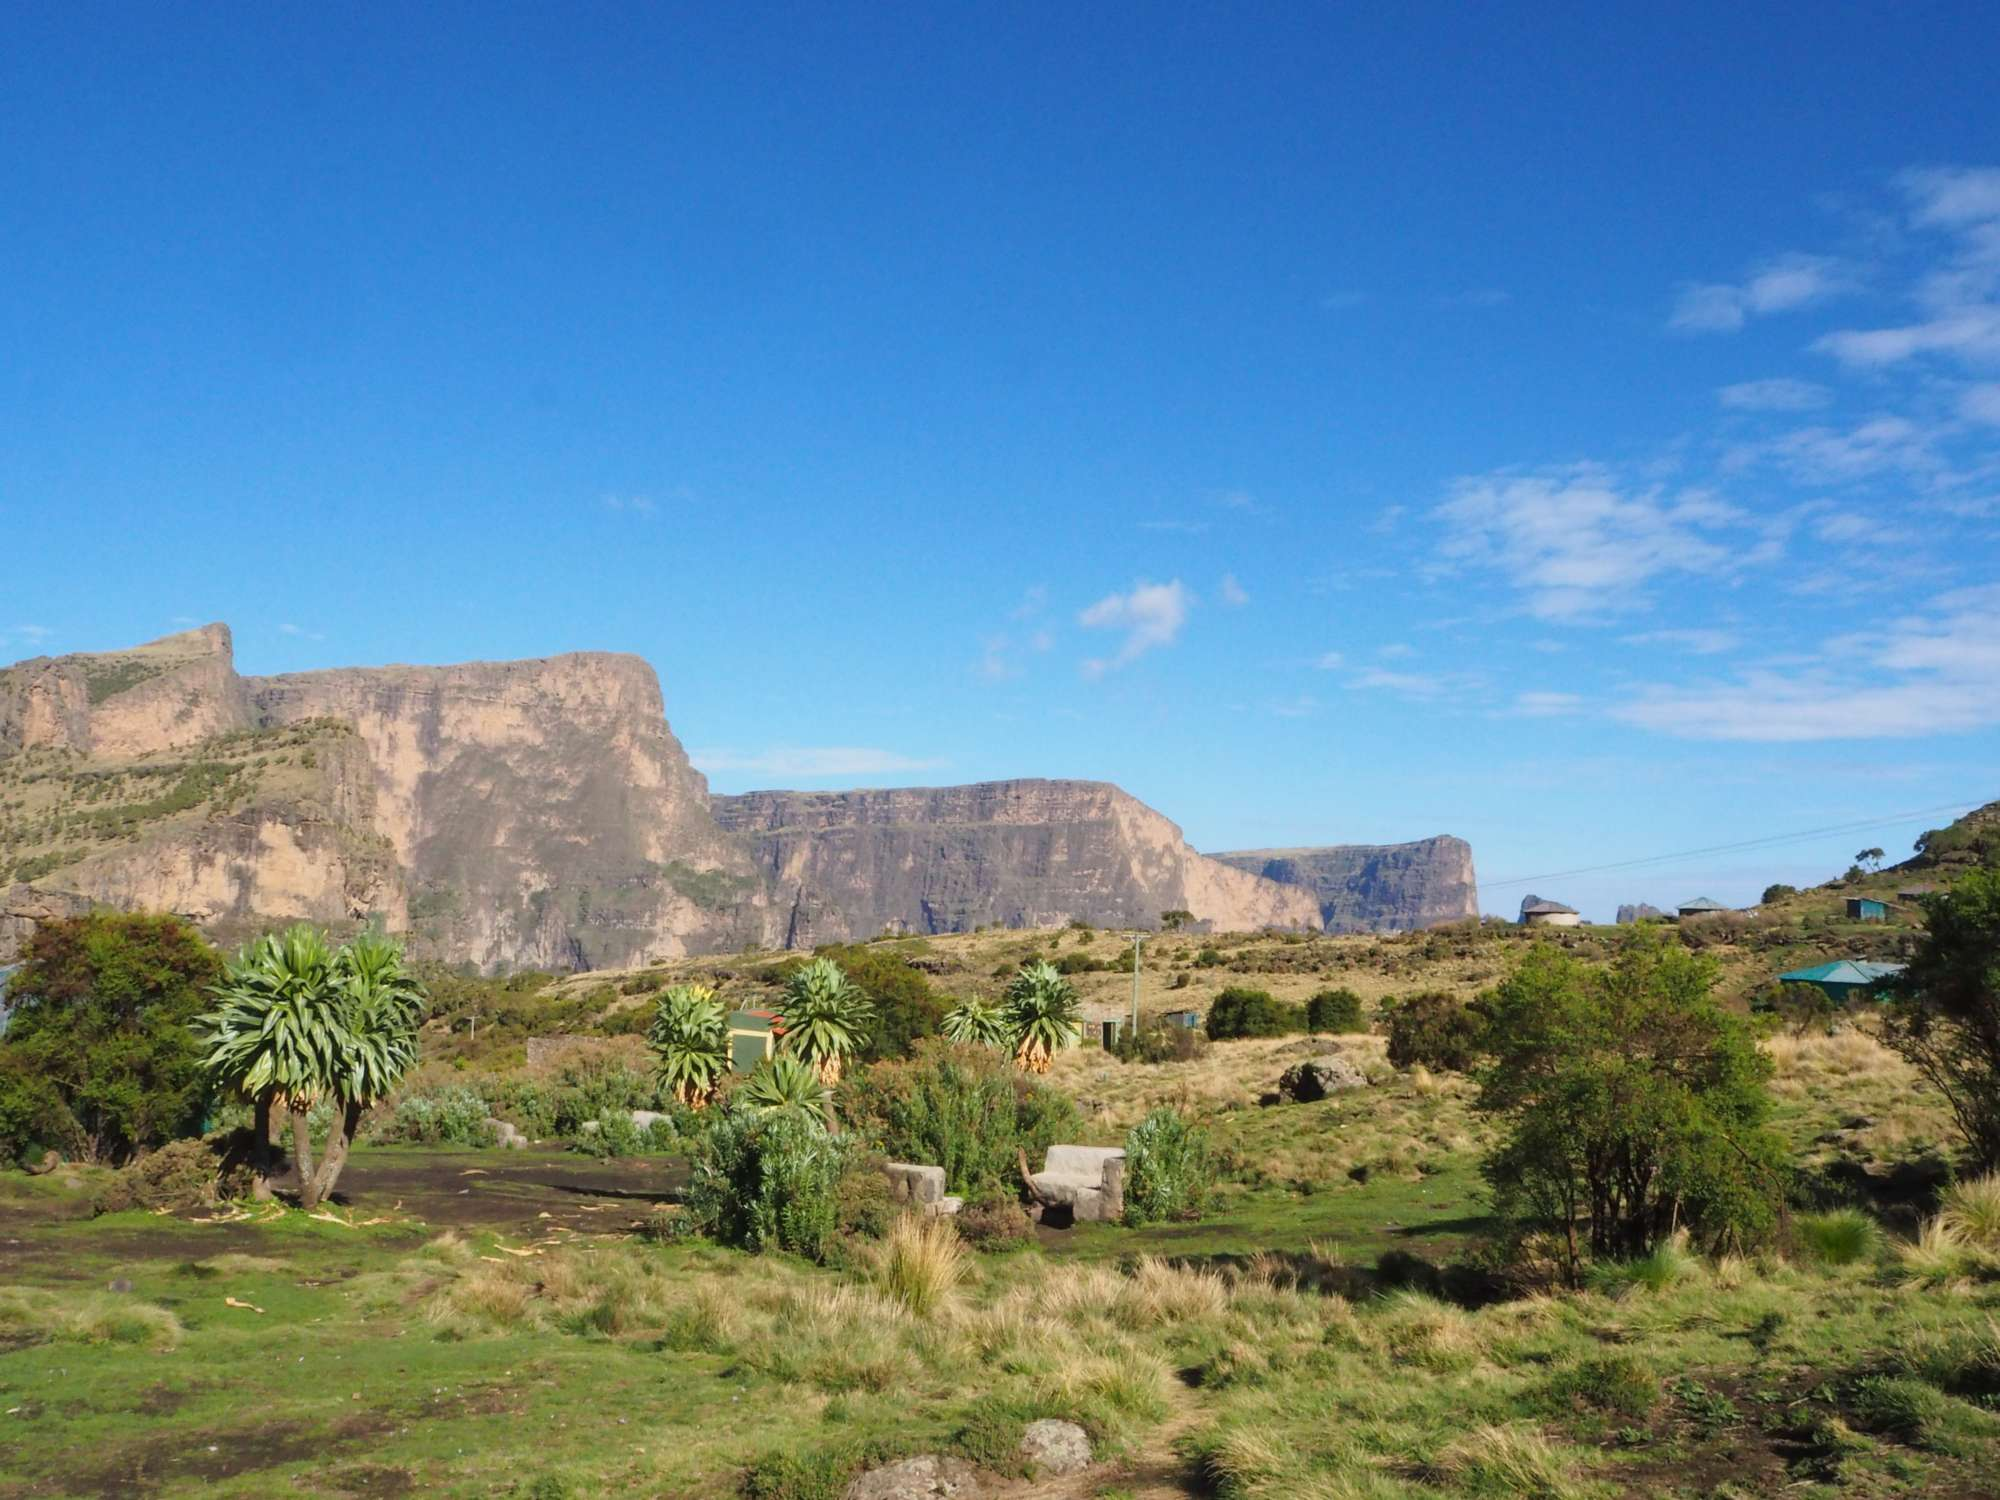 Trekking-Ethiopias-Simien-Mountains-Mafia-AK-47s-and-a-Park-at-Risk-high-rocks